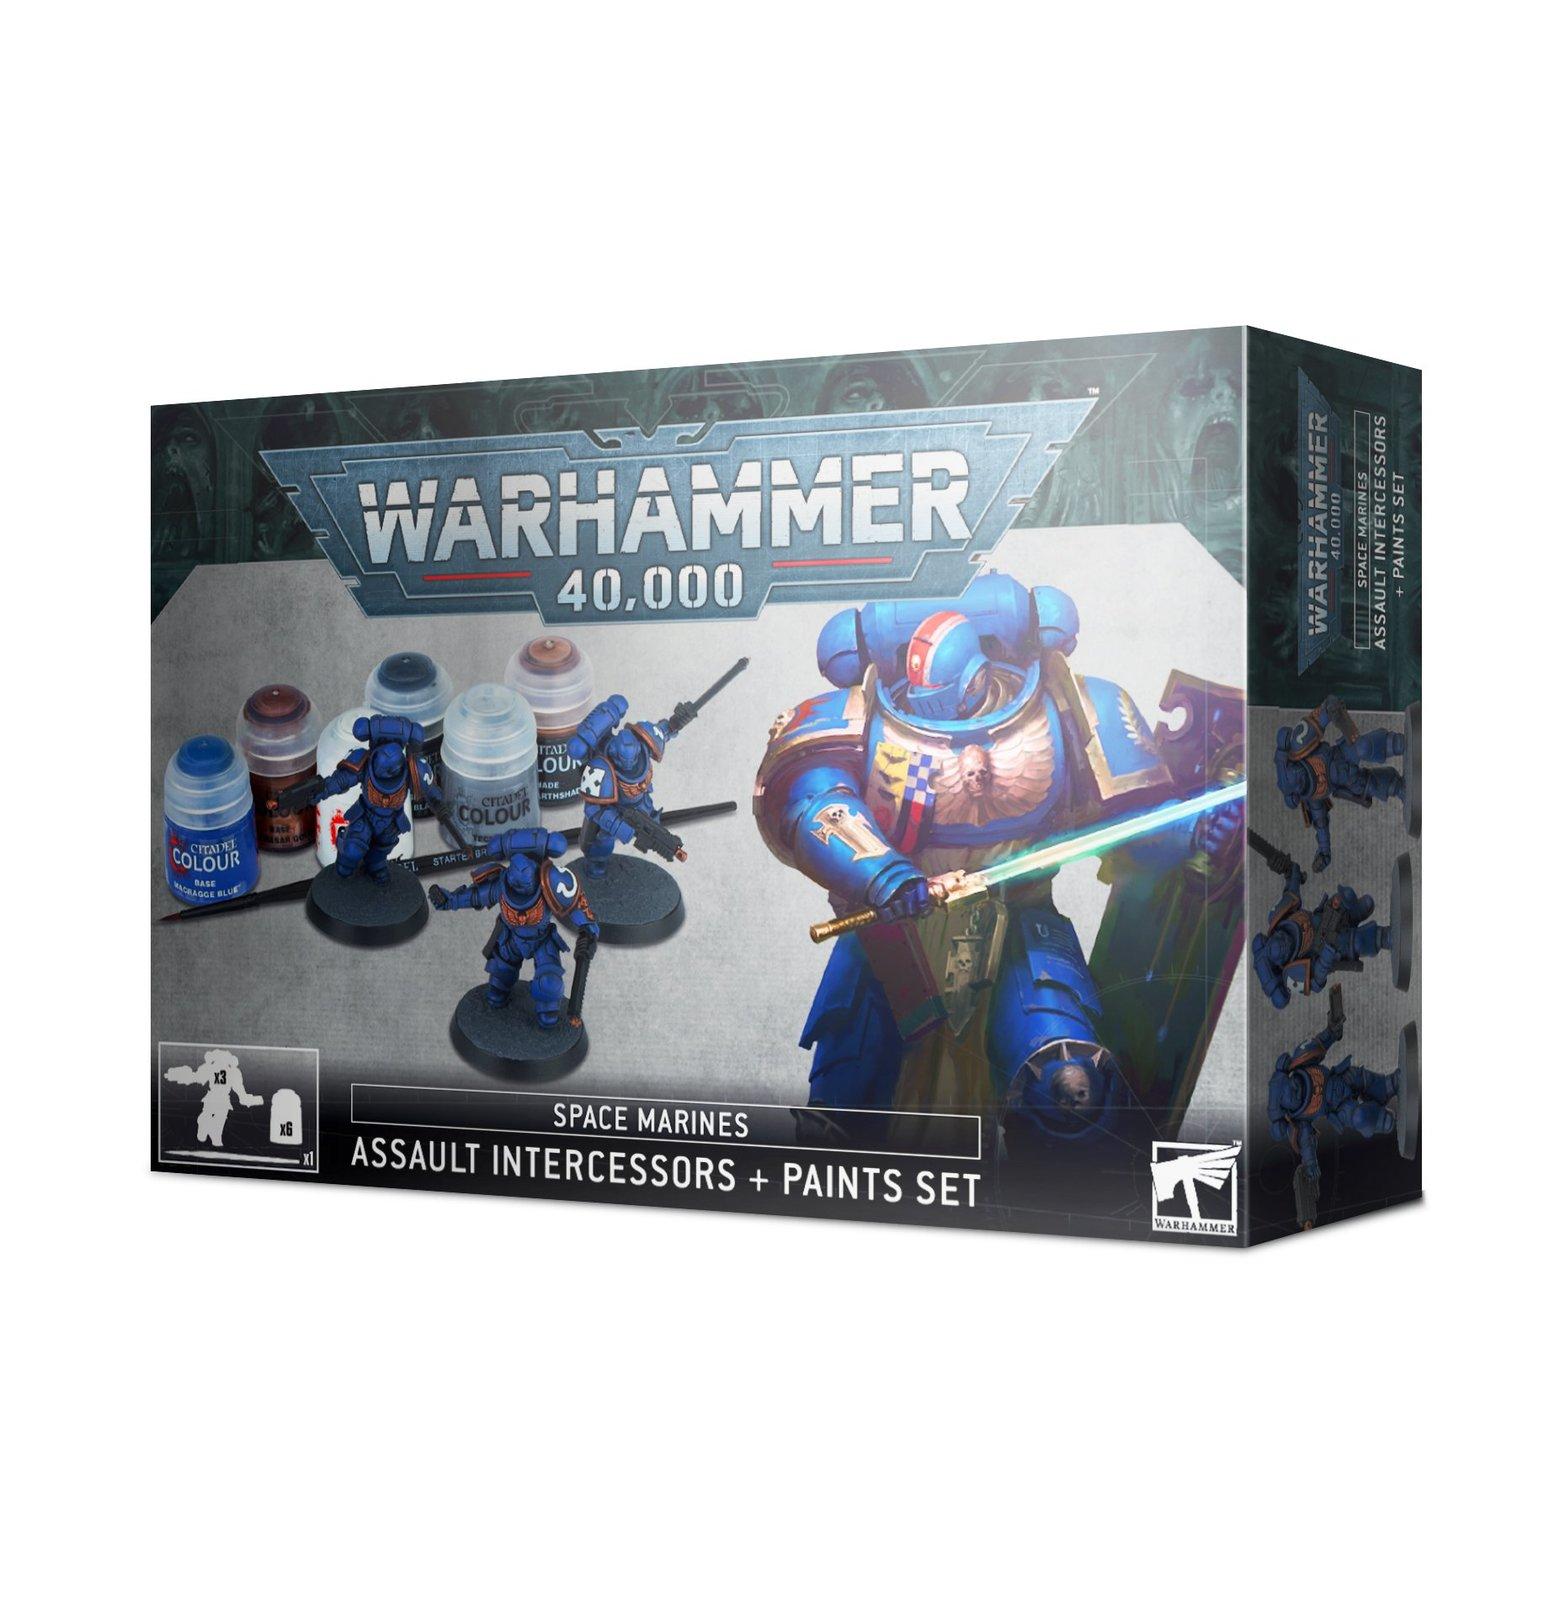 Warhammer 40,000: Assault Intercessors + Paints Set image